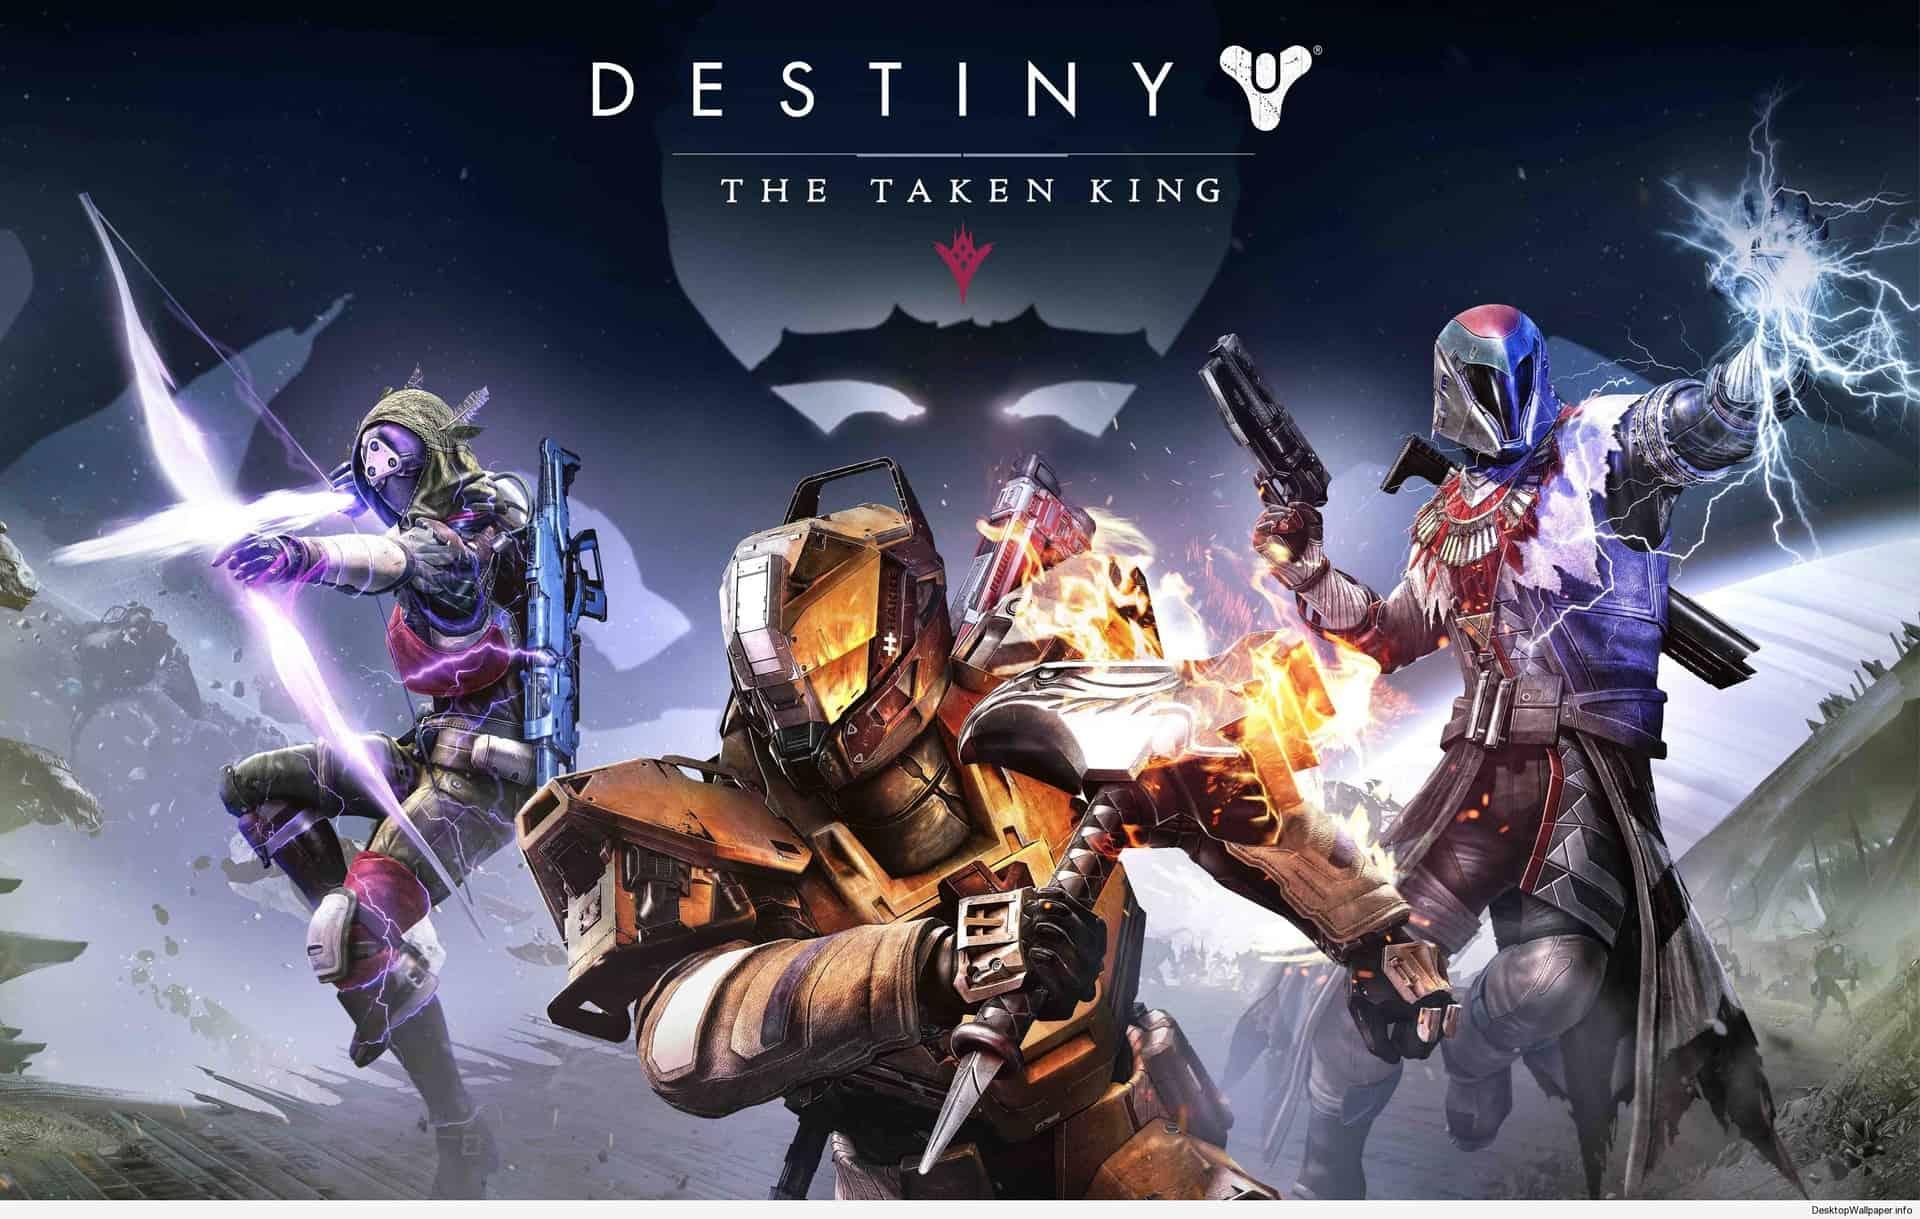 4k gaming wallpaper destiny | Desktop Wallpapers